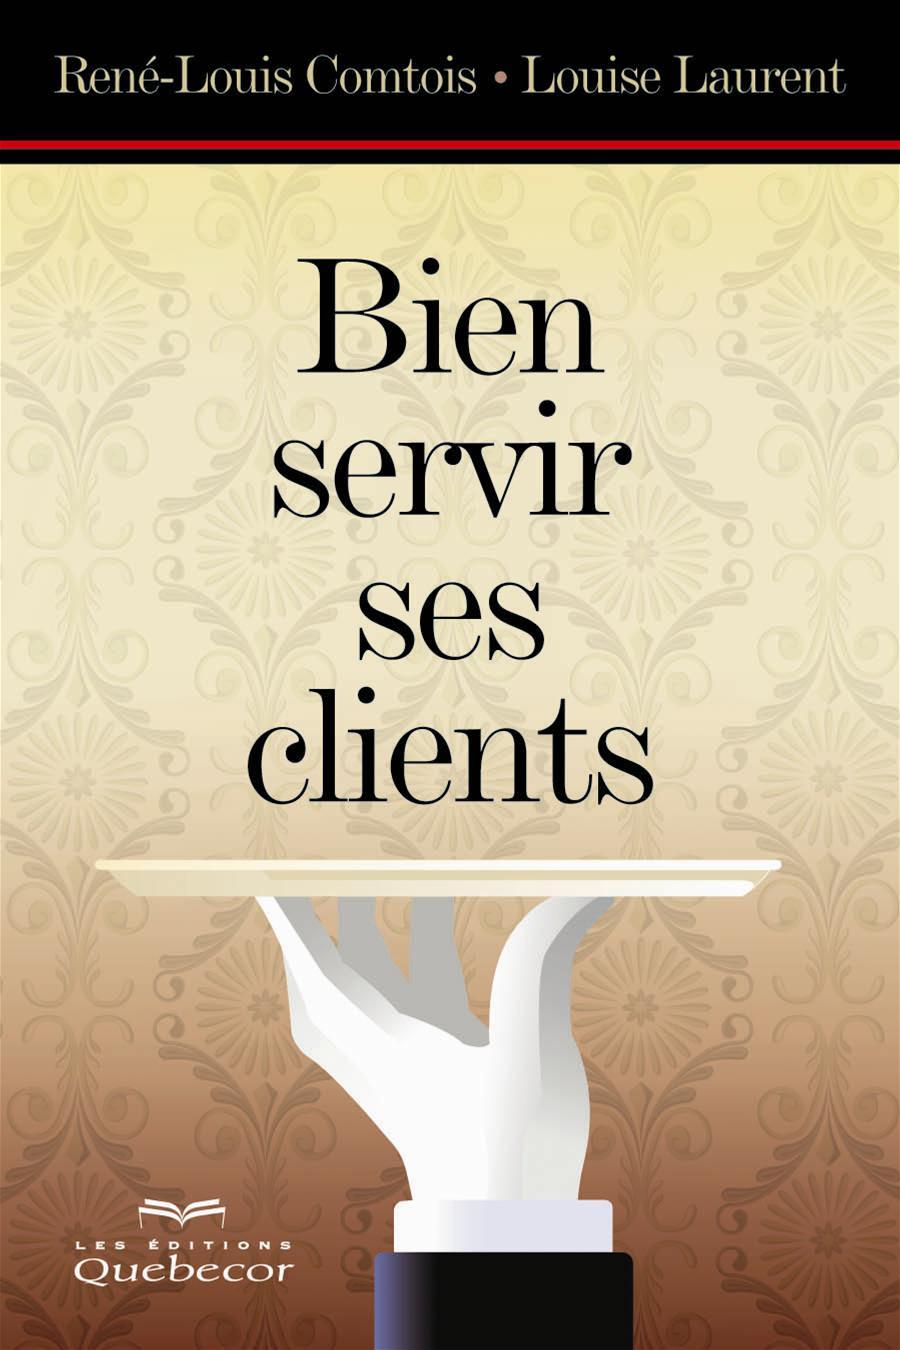 Bien servir ses clients